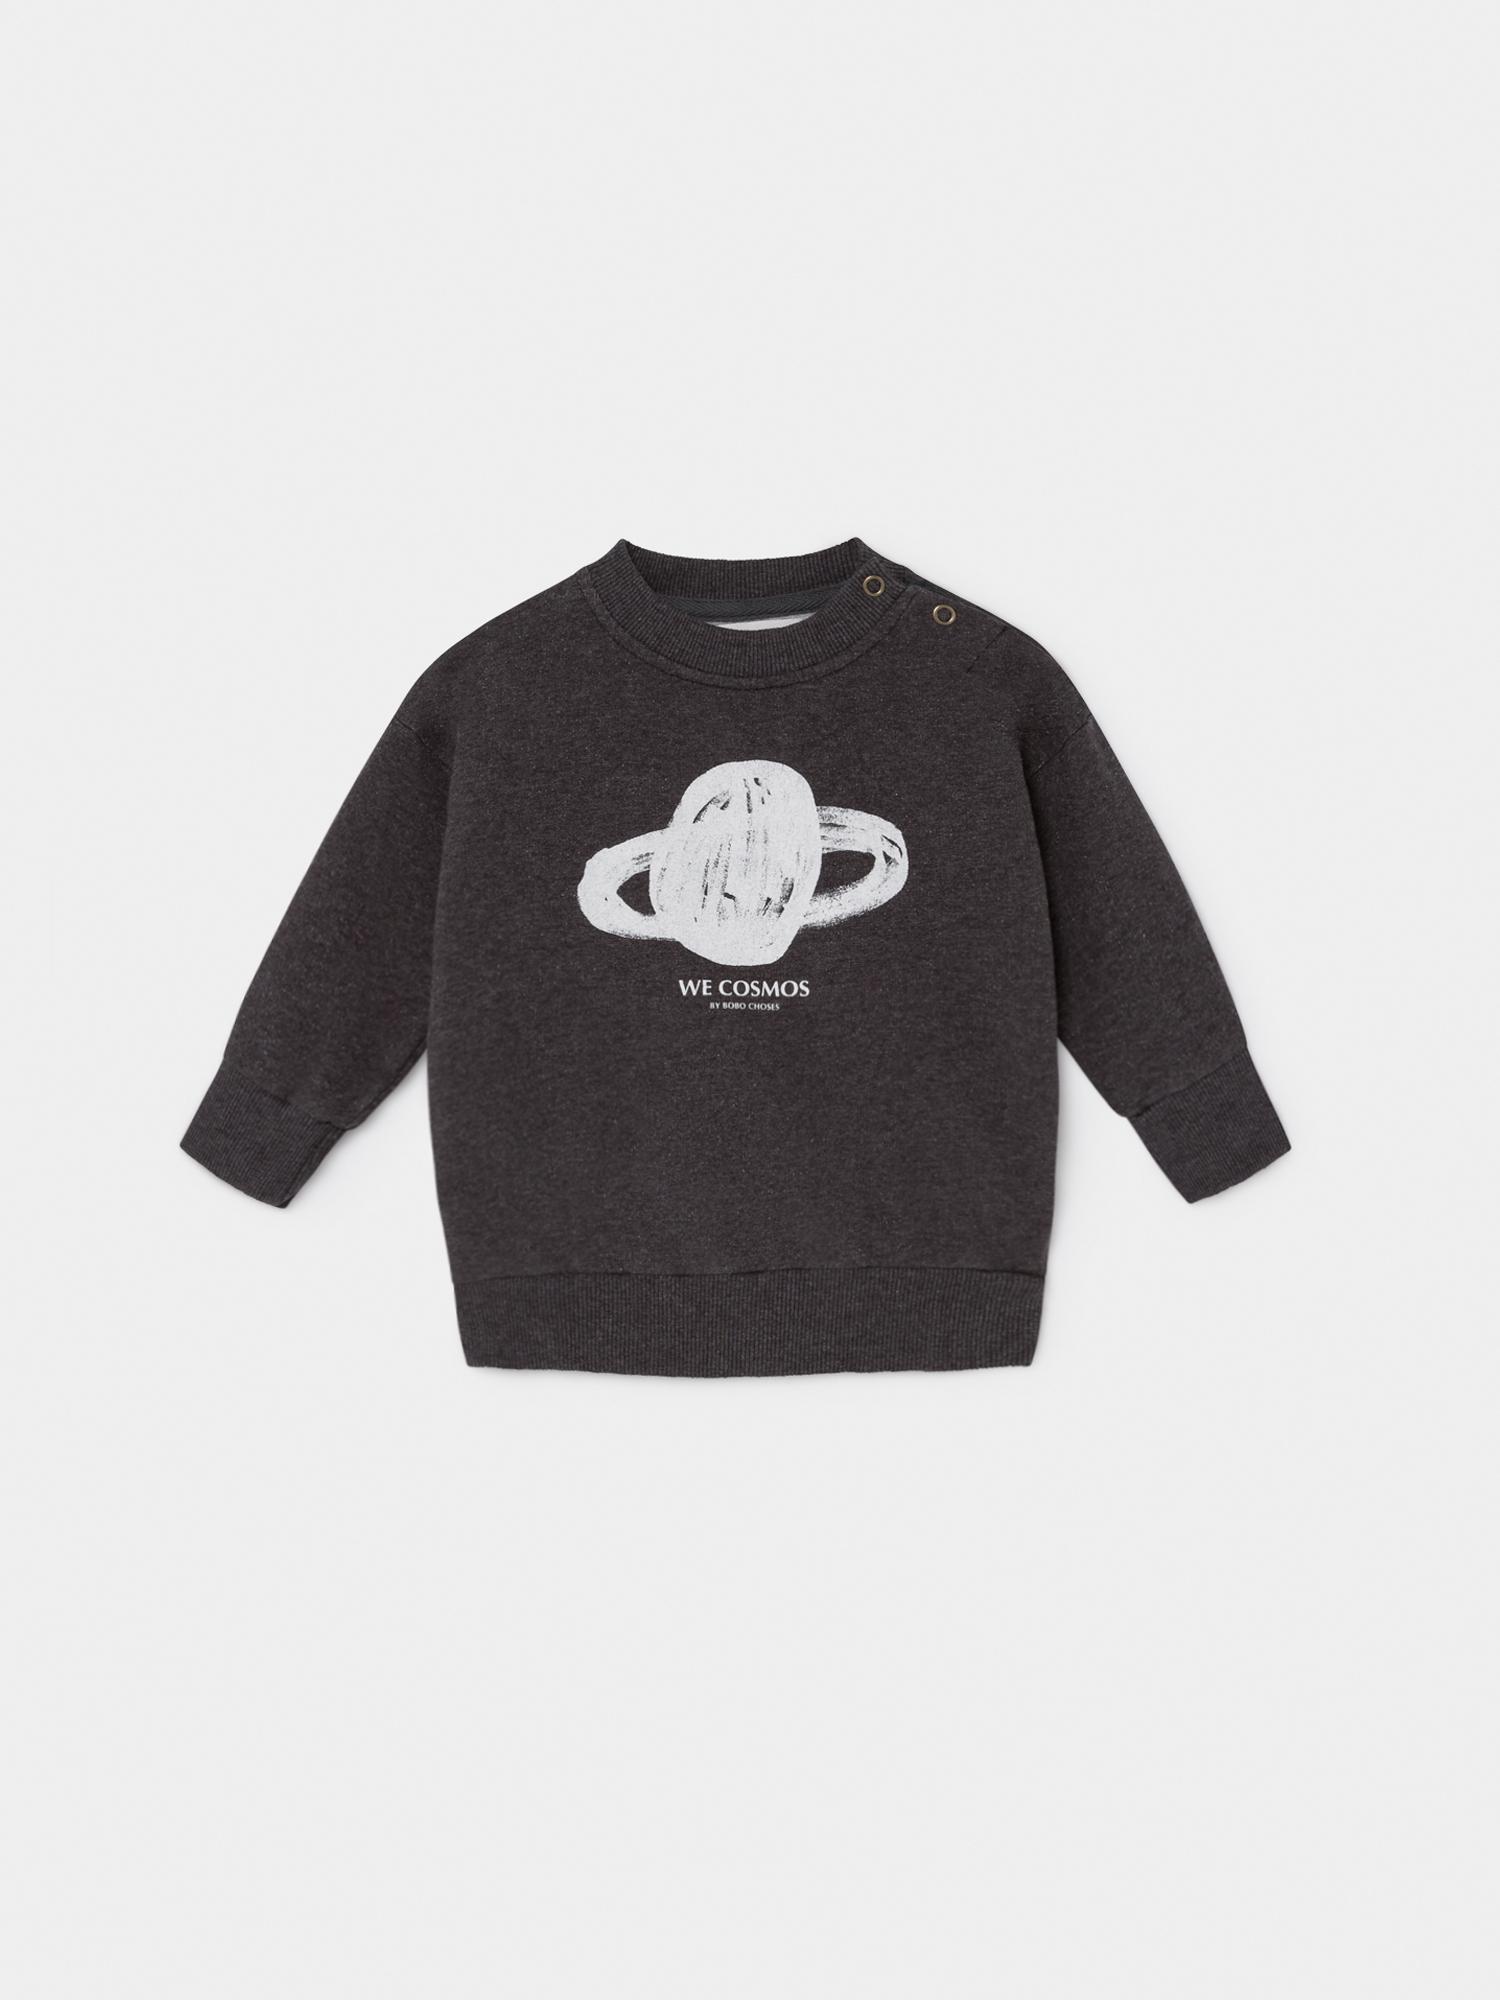 《BOBO CHOSES 2019AW》Mercury sweatshirt / 12-36M